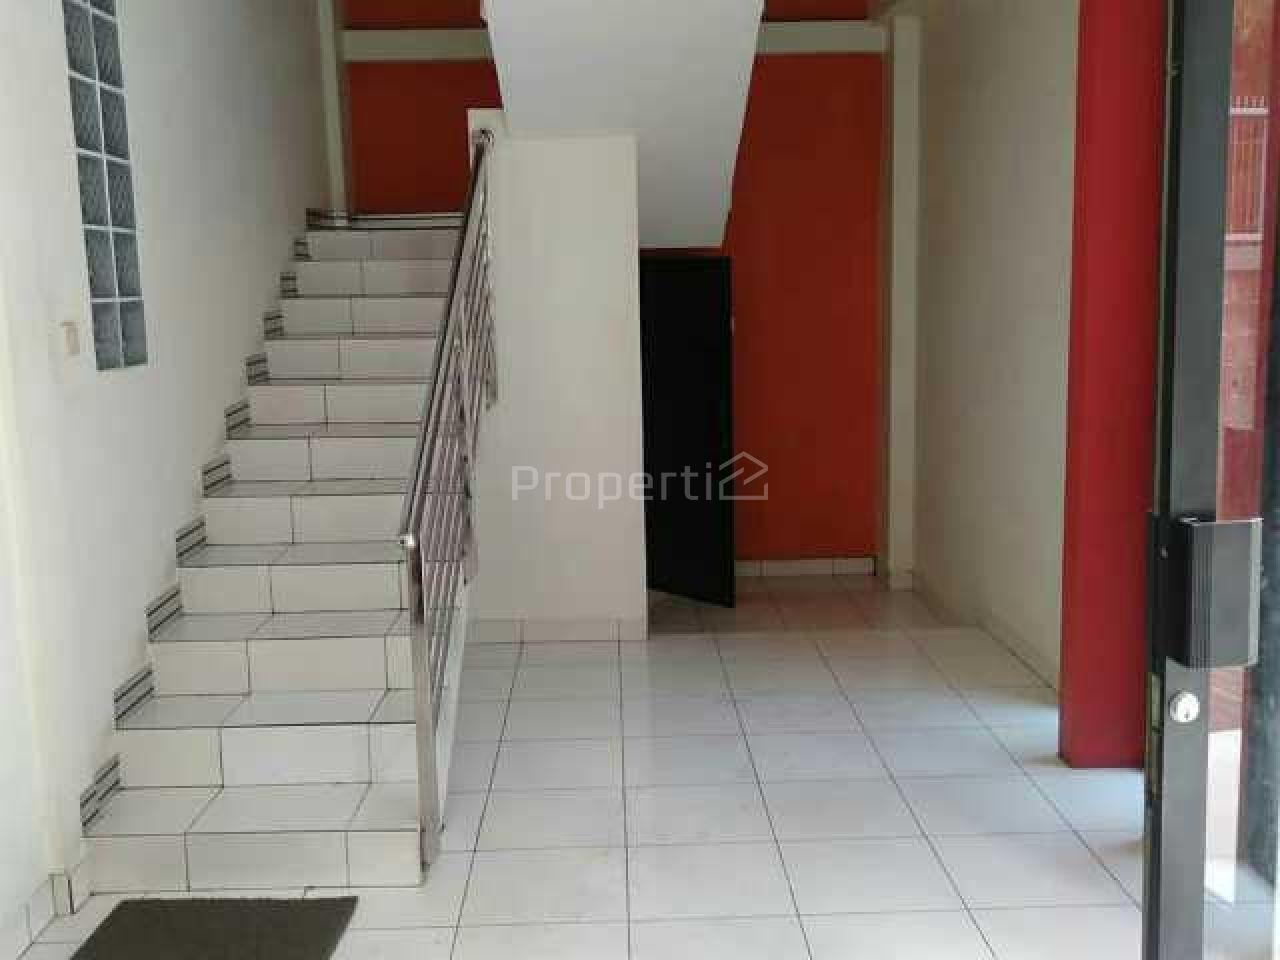 Bangunan 2 Lantai Strategis di Pinggir Jalan Utama, Rancabolang, Jawa Barat